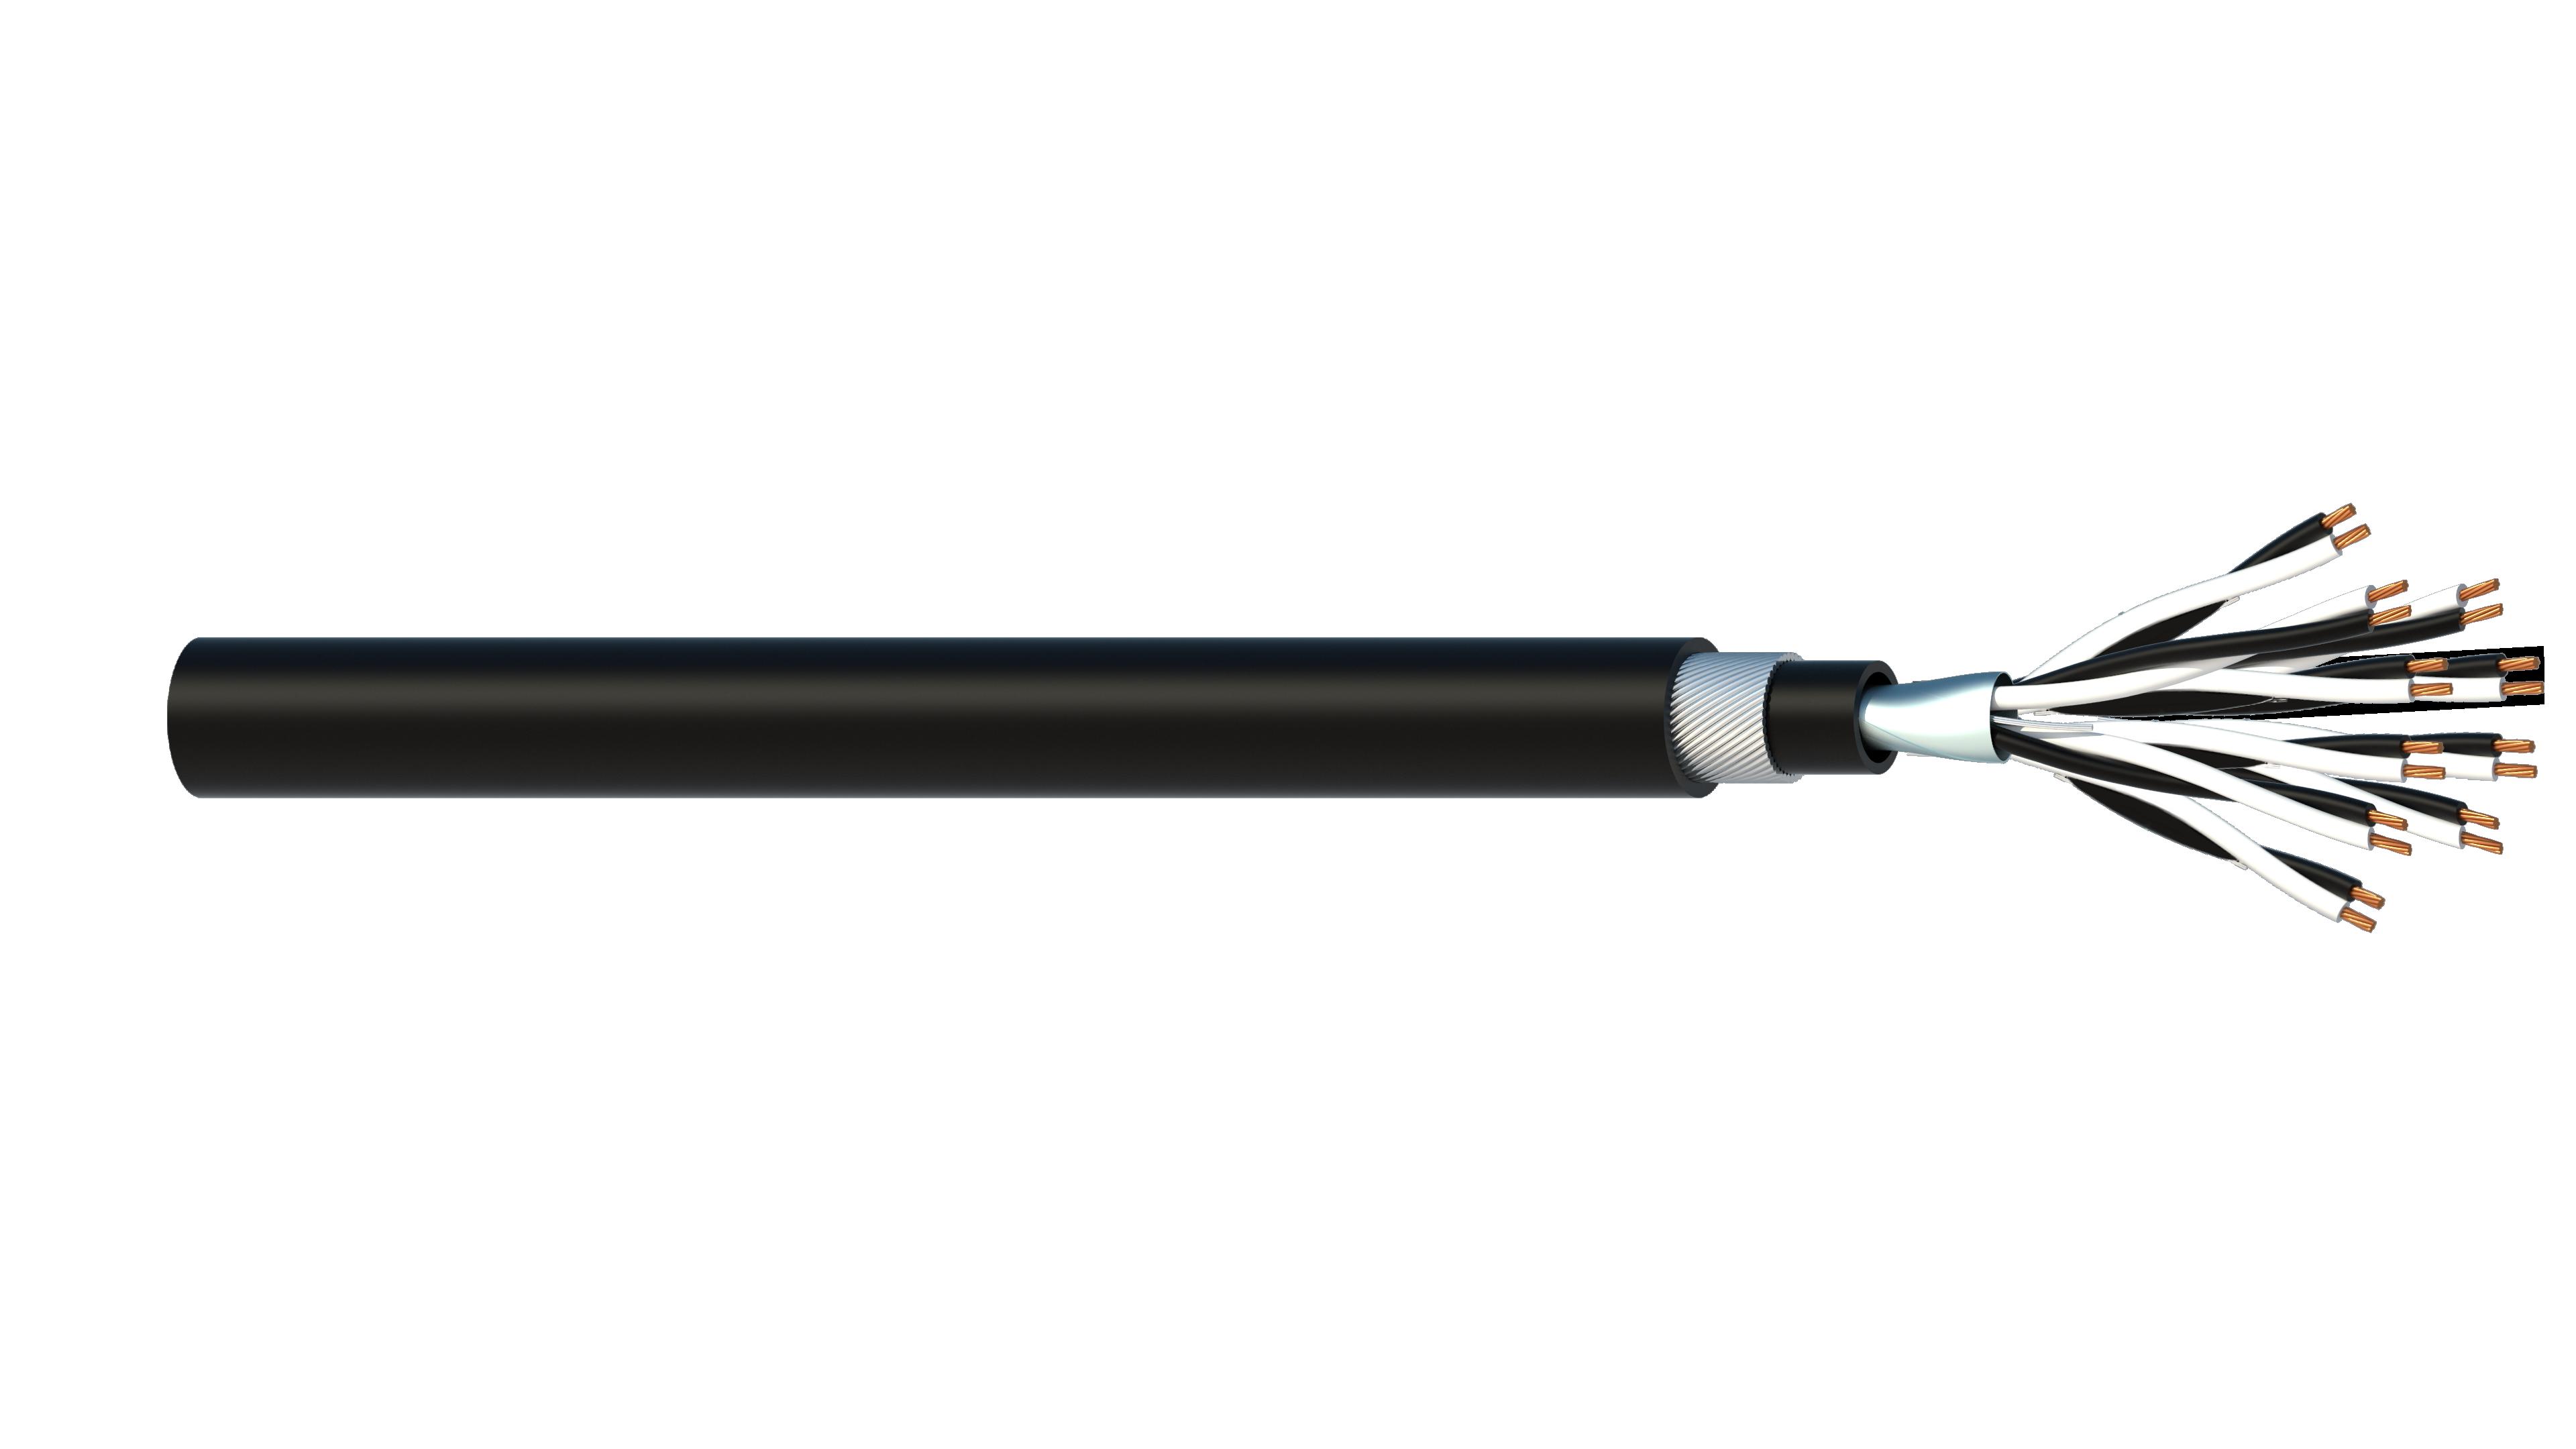 10 Pair 0.5mm2 Cu/PVC/OS/PVC/SWA/PVC Maser Instrumentation Cable - Black Sheath